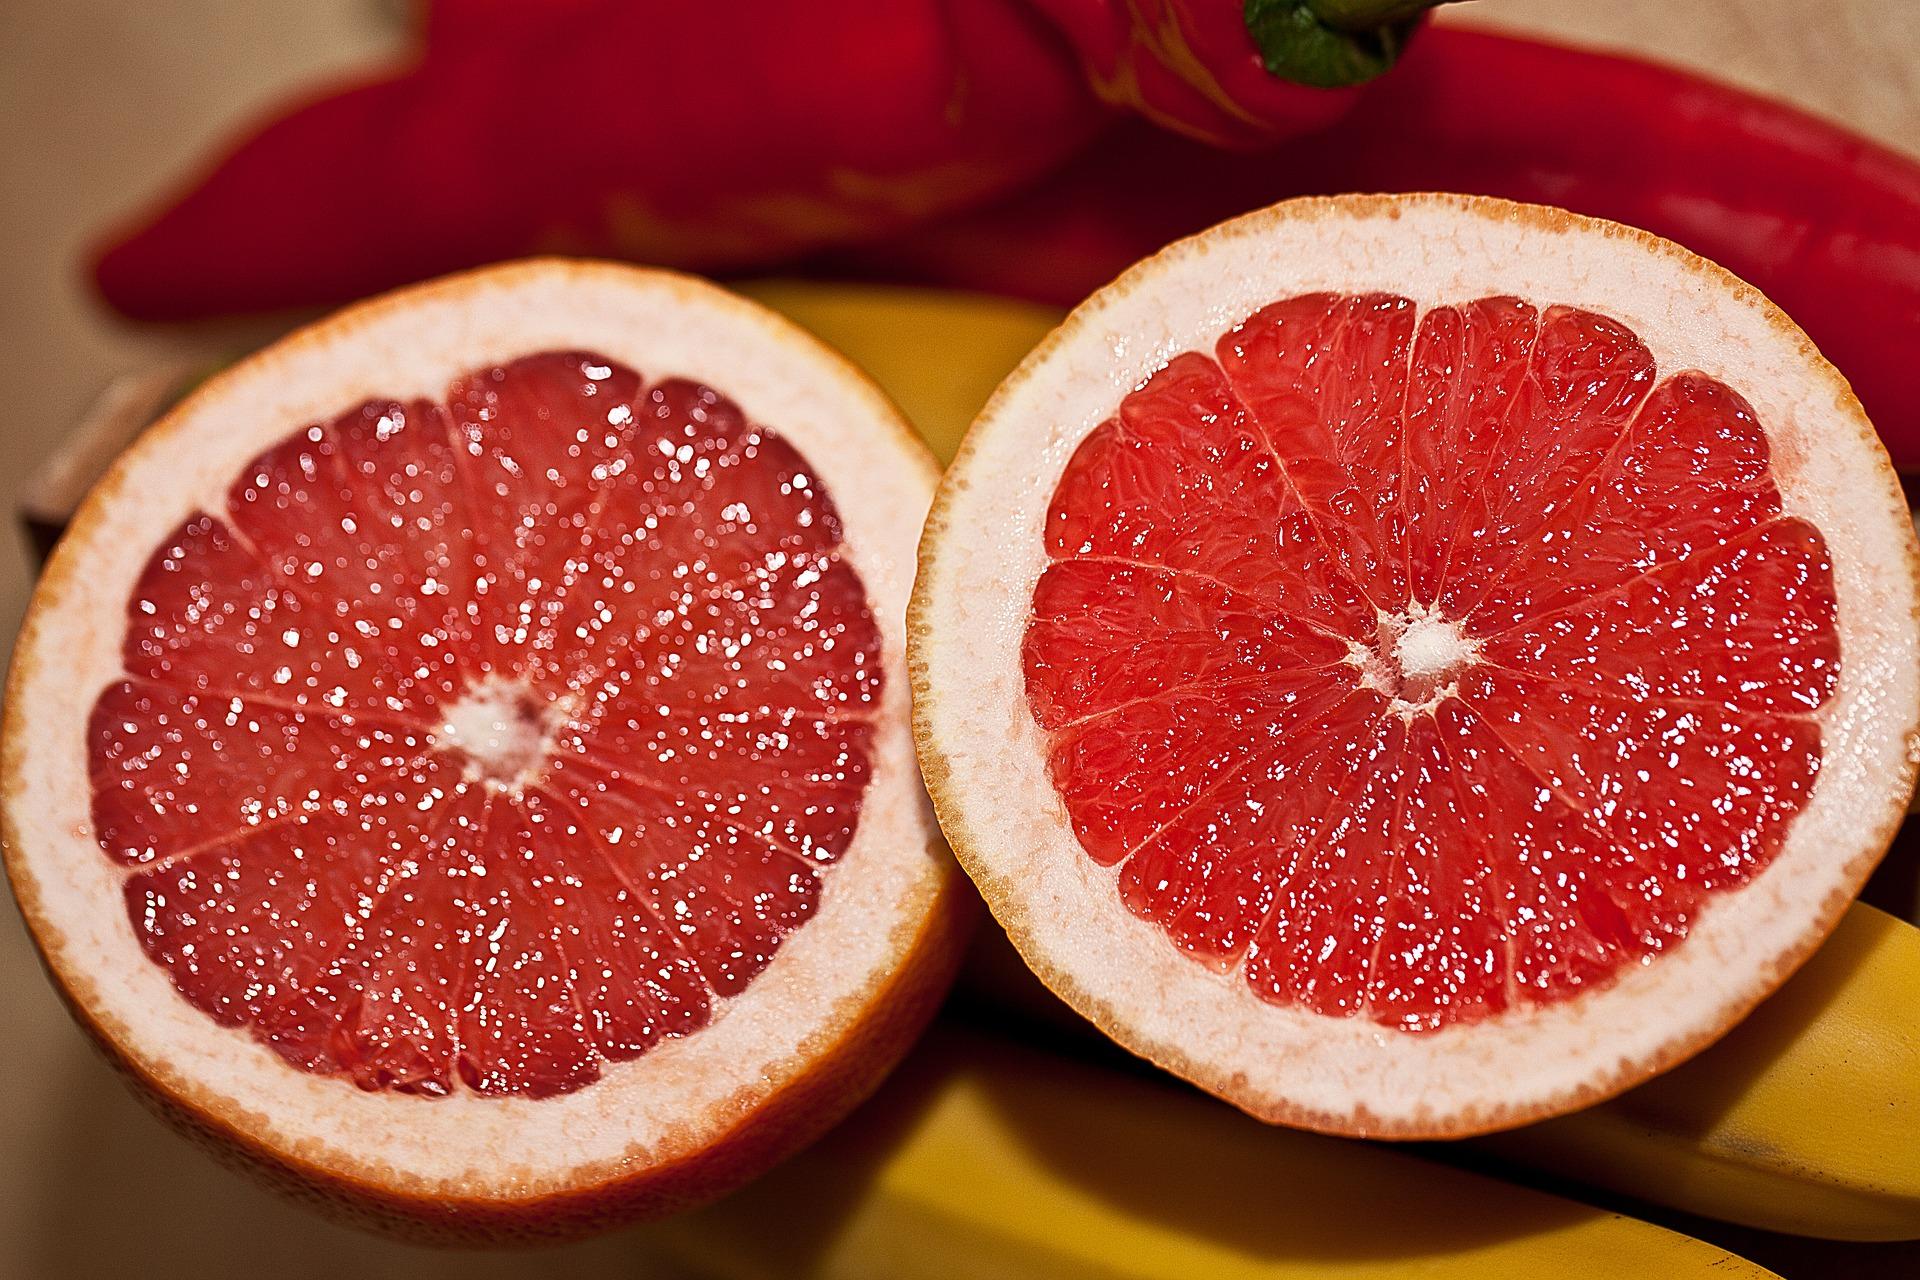 Grapefruit good for diabetics